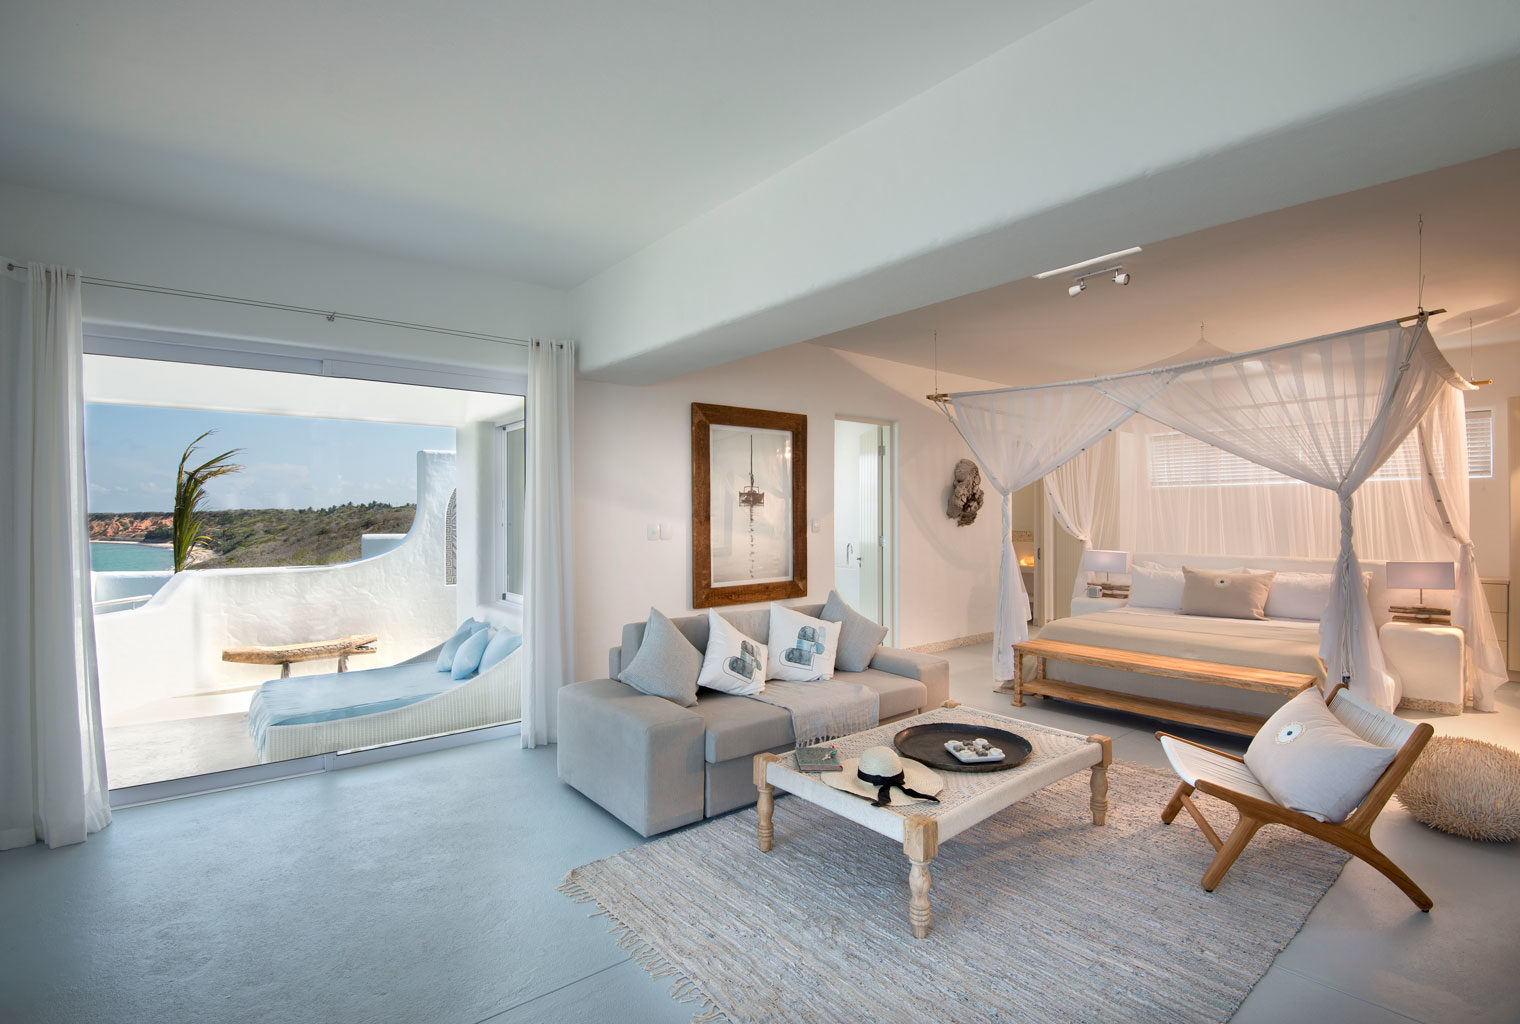 Santorini-Mozambique-Bedroom